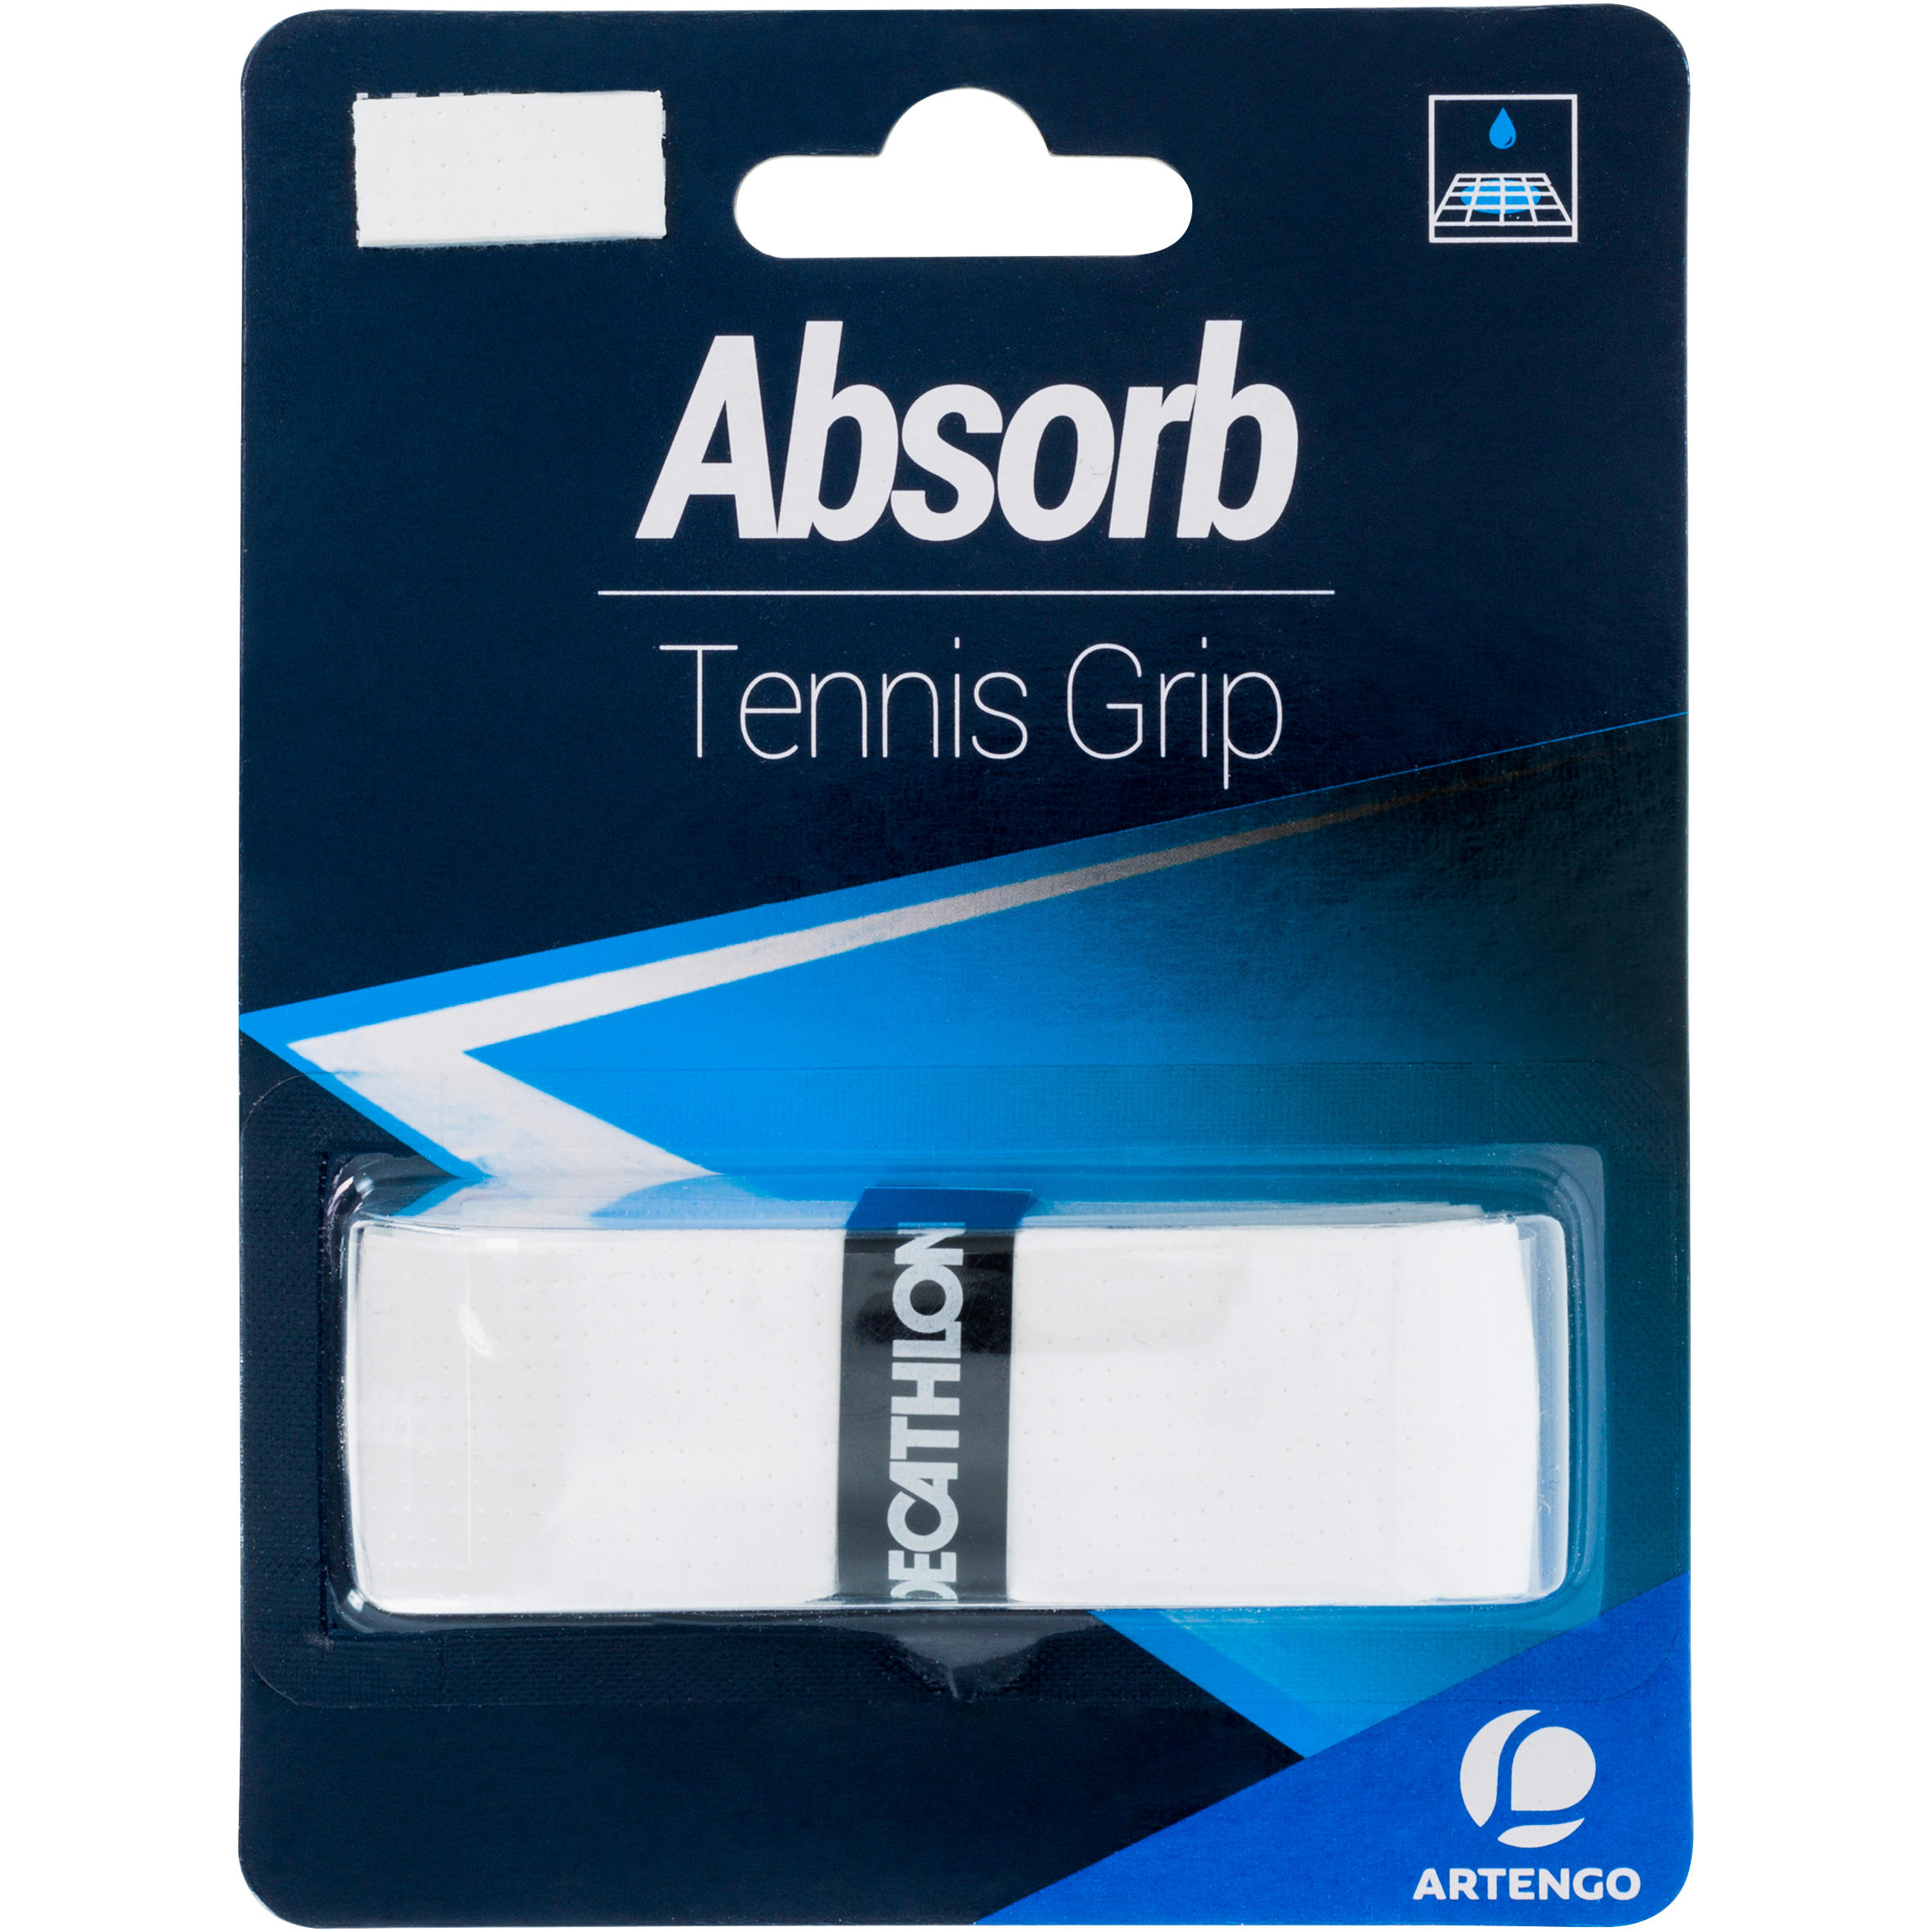 Absorb Tennis Grip...